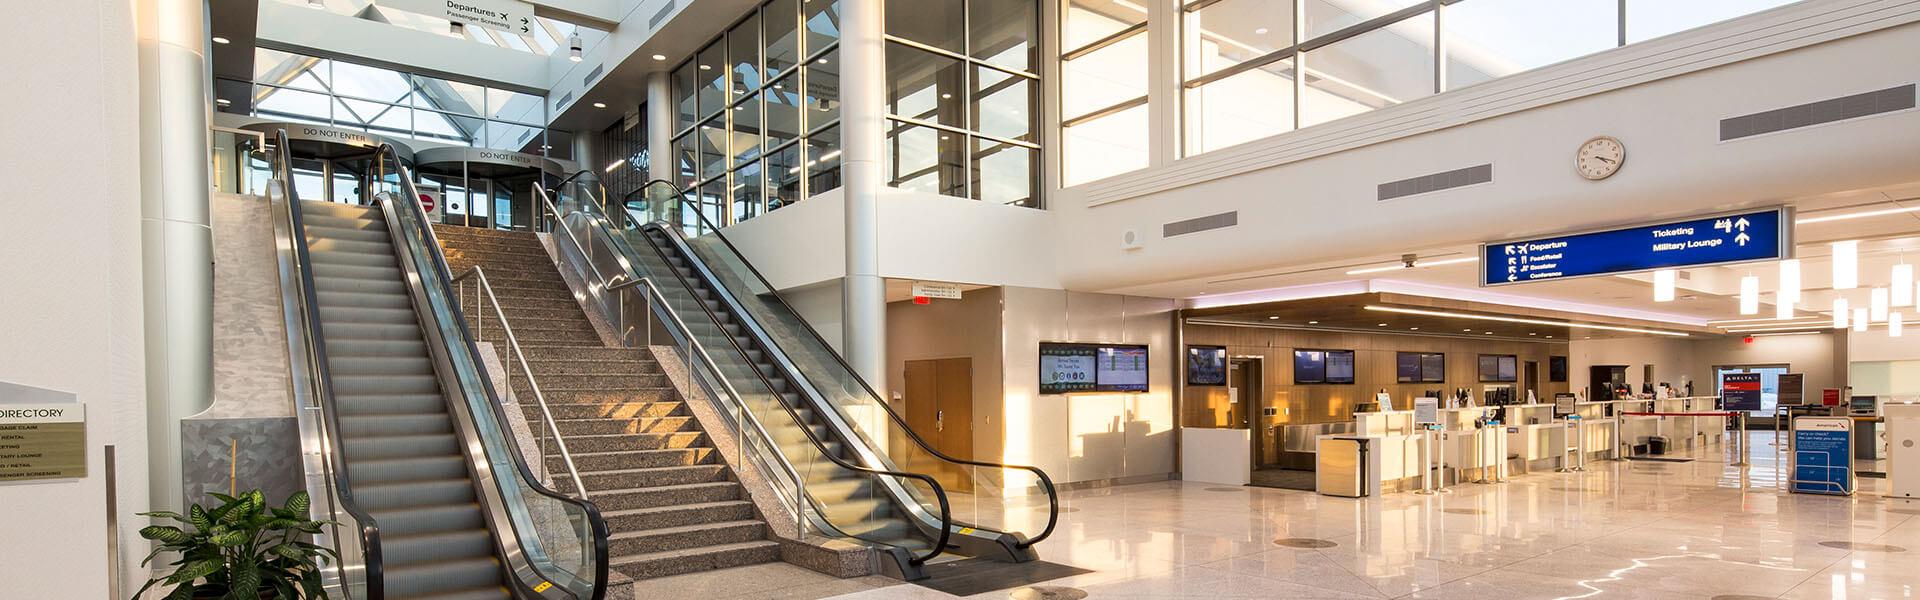 immel-banner_La Crosse Regional Airport